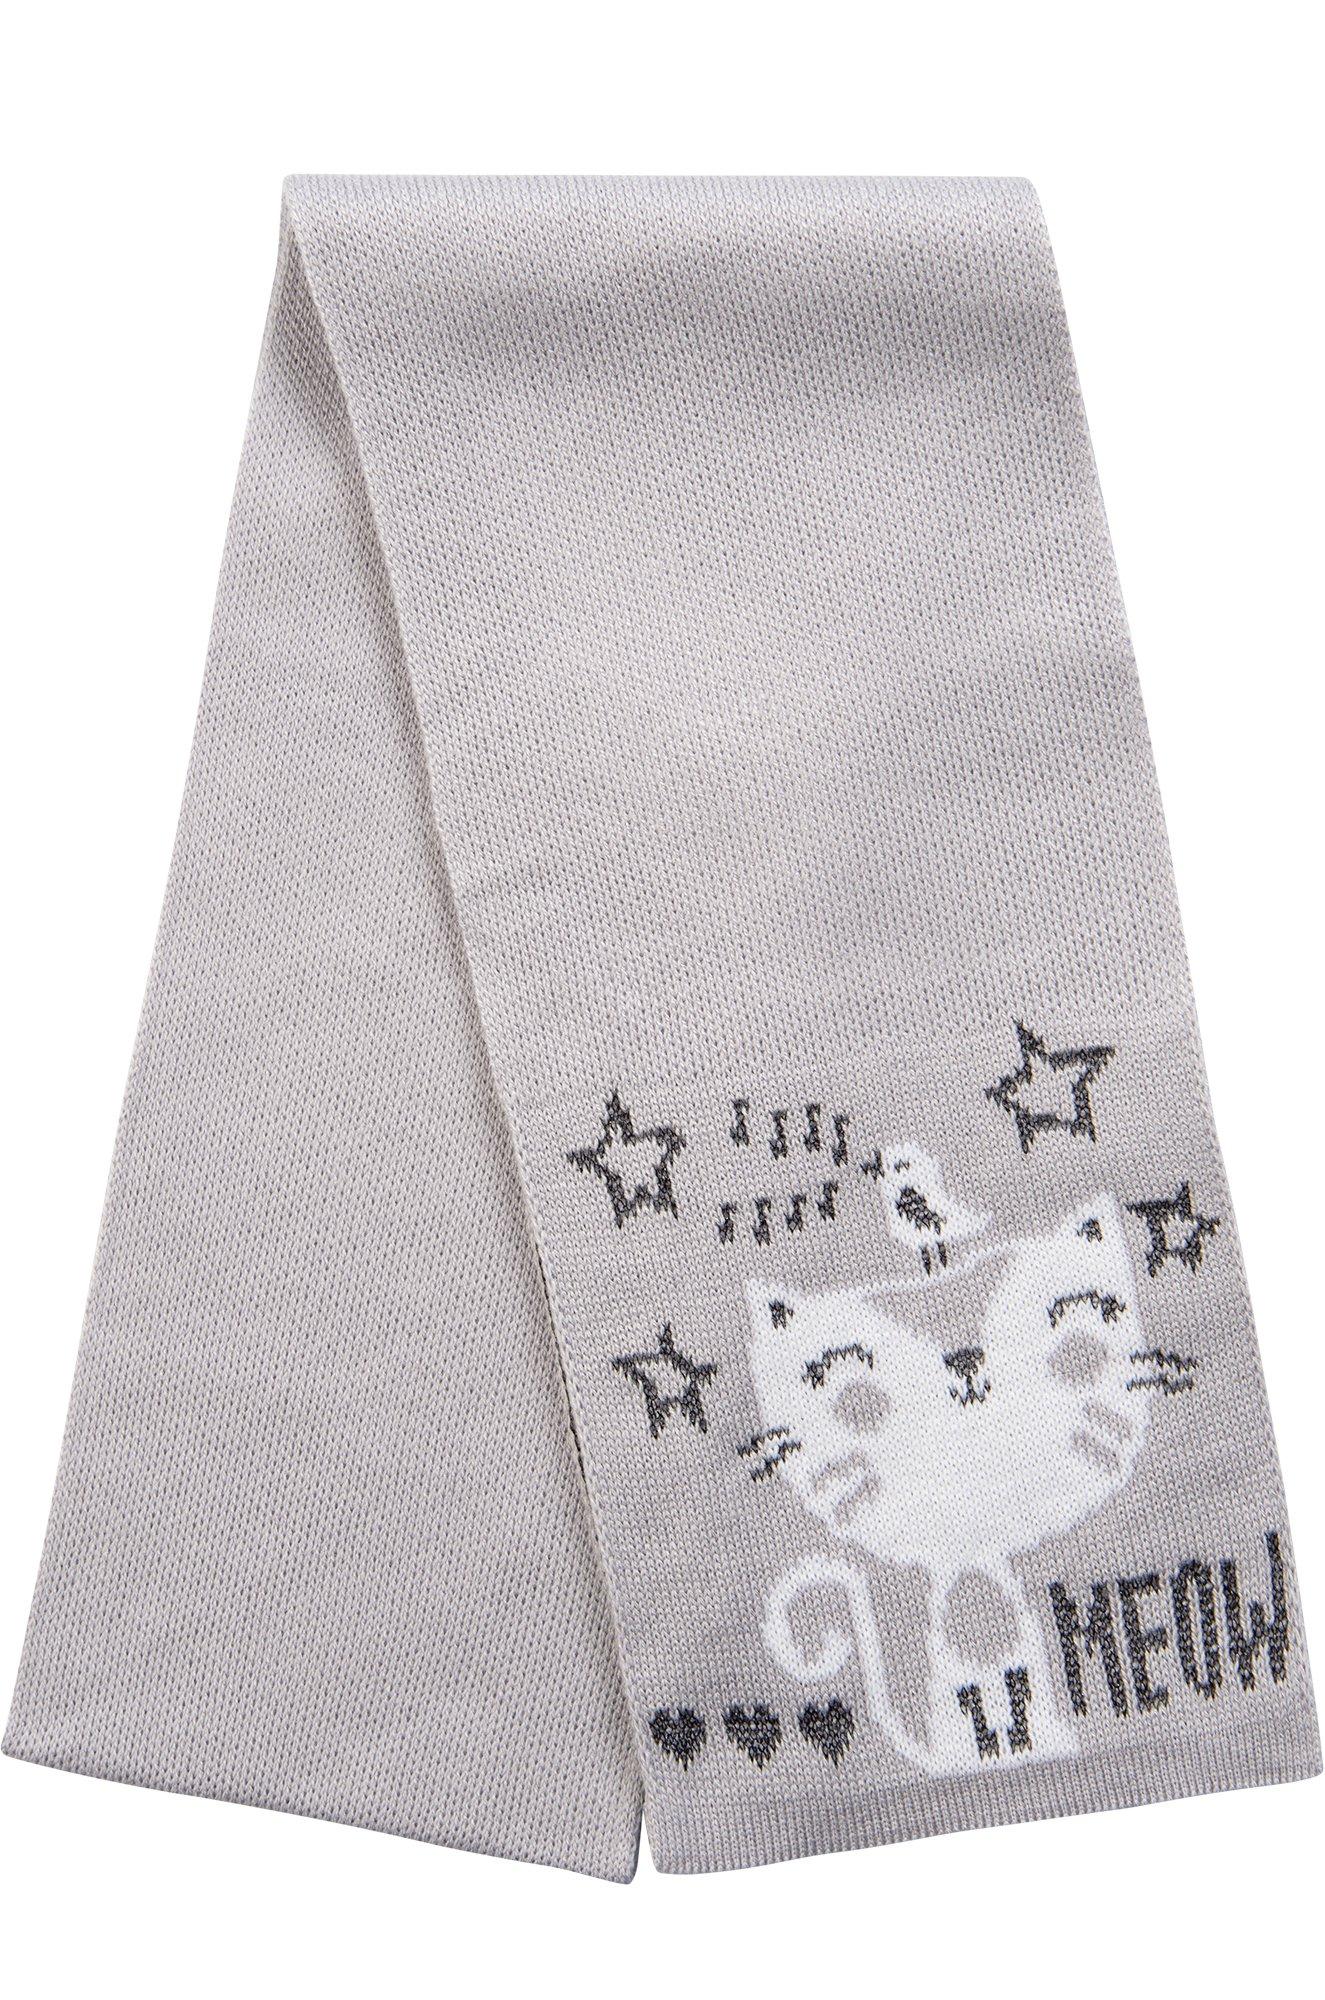 Мегашапка, Шарф для девочки Мегашапка MG12235 (1938643994)